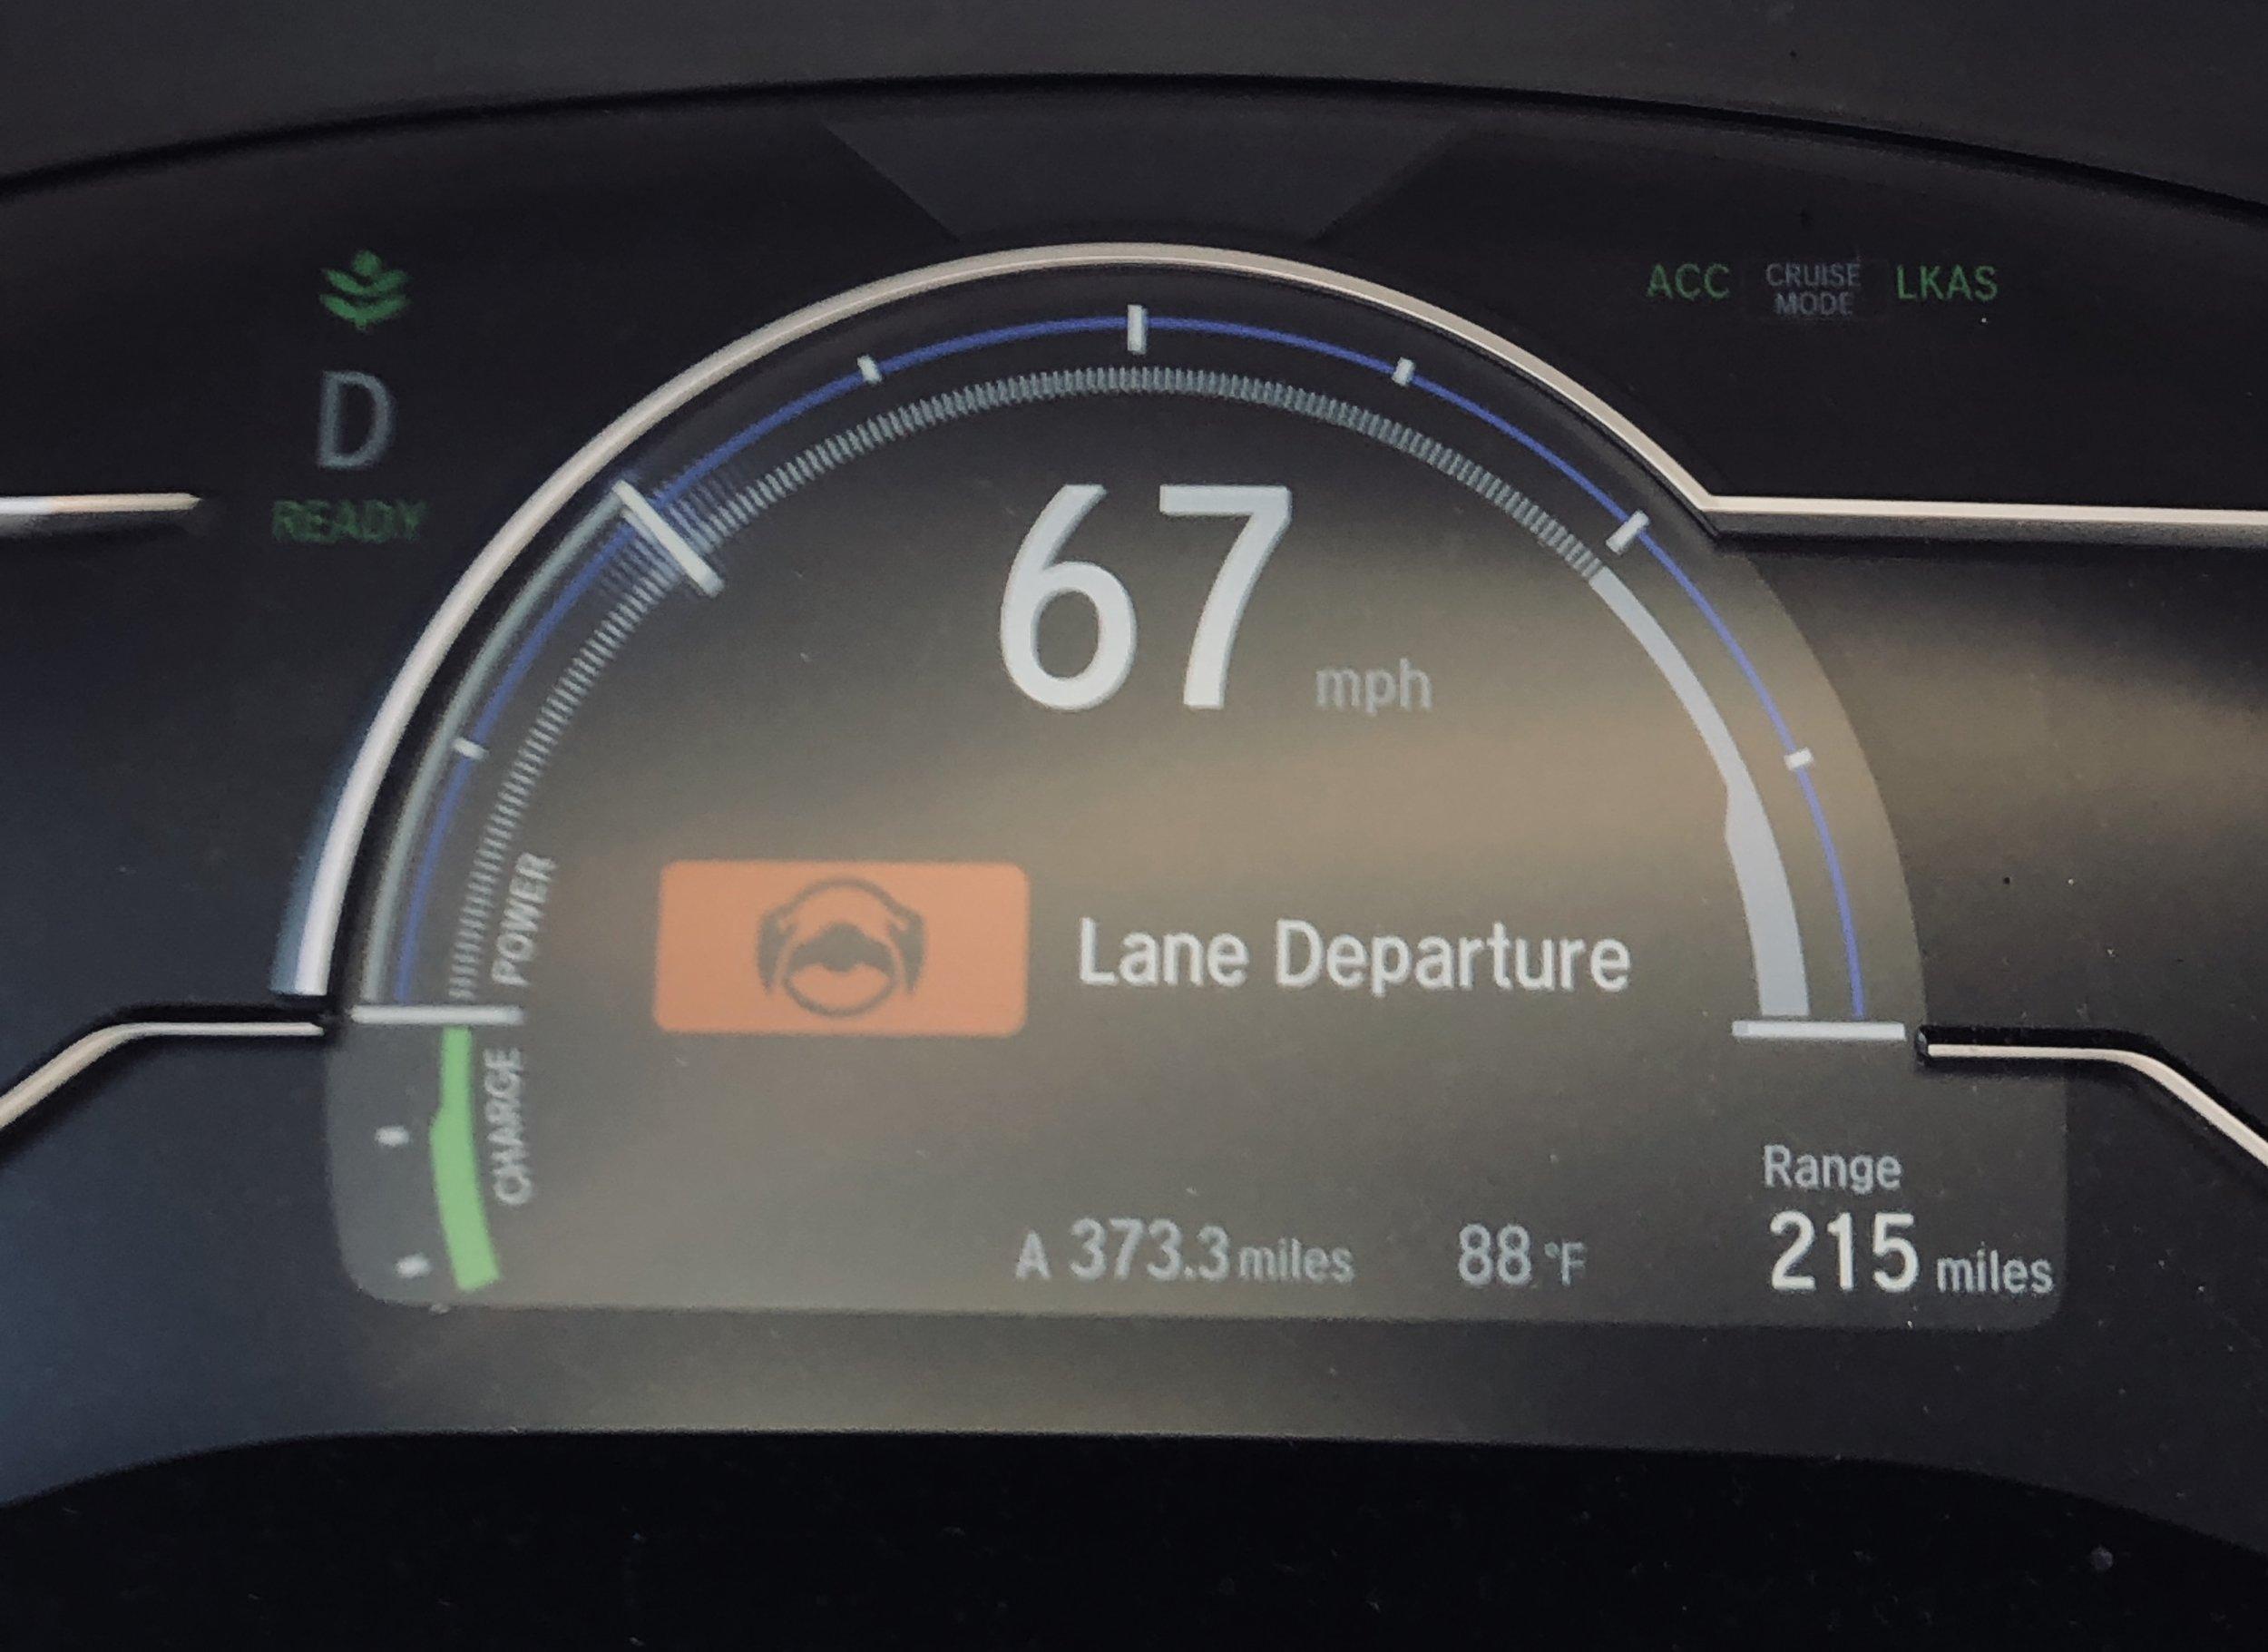 Warner: Lane Departure